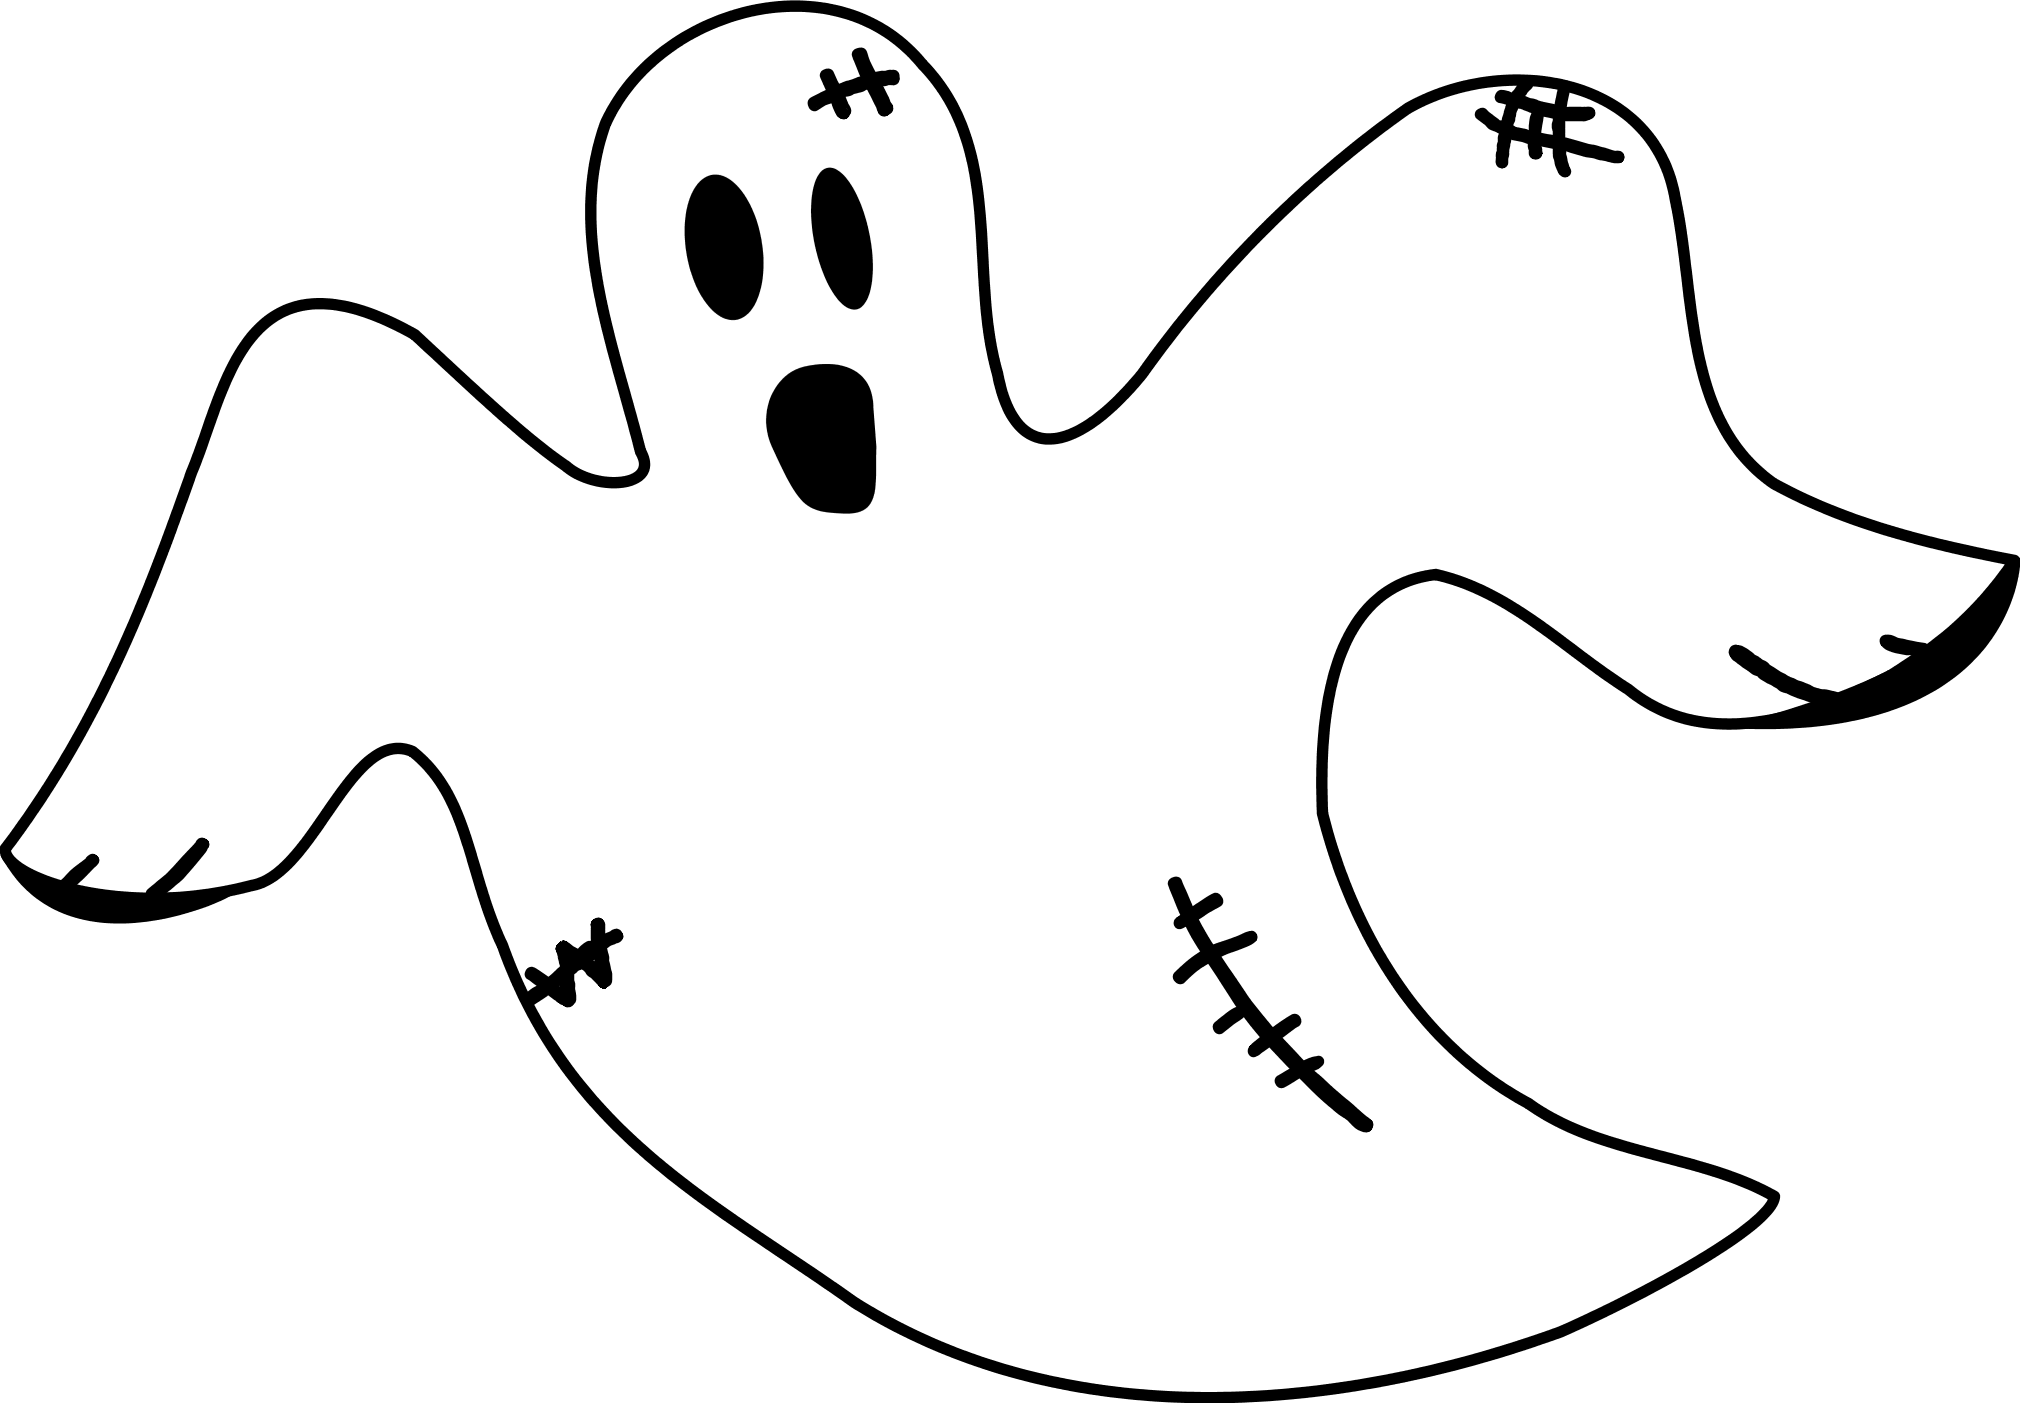 Ghost Clip Art - Clip Art Ghost